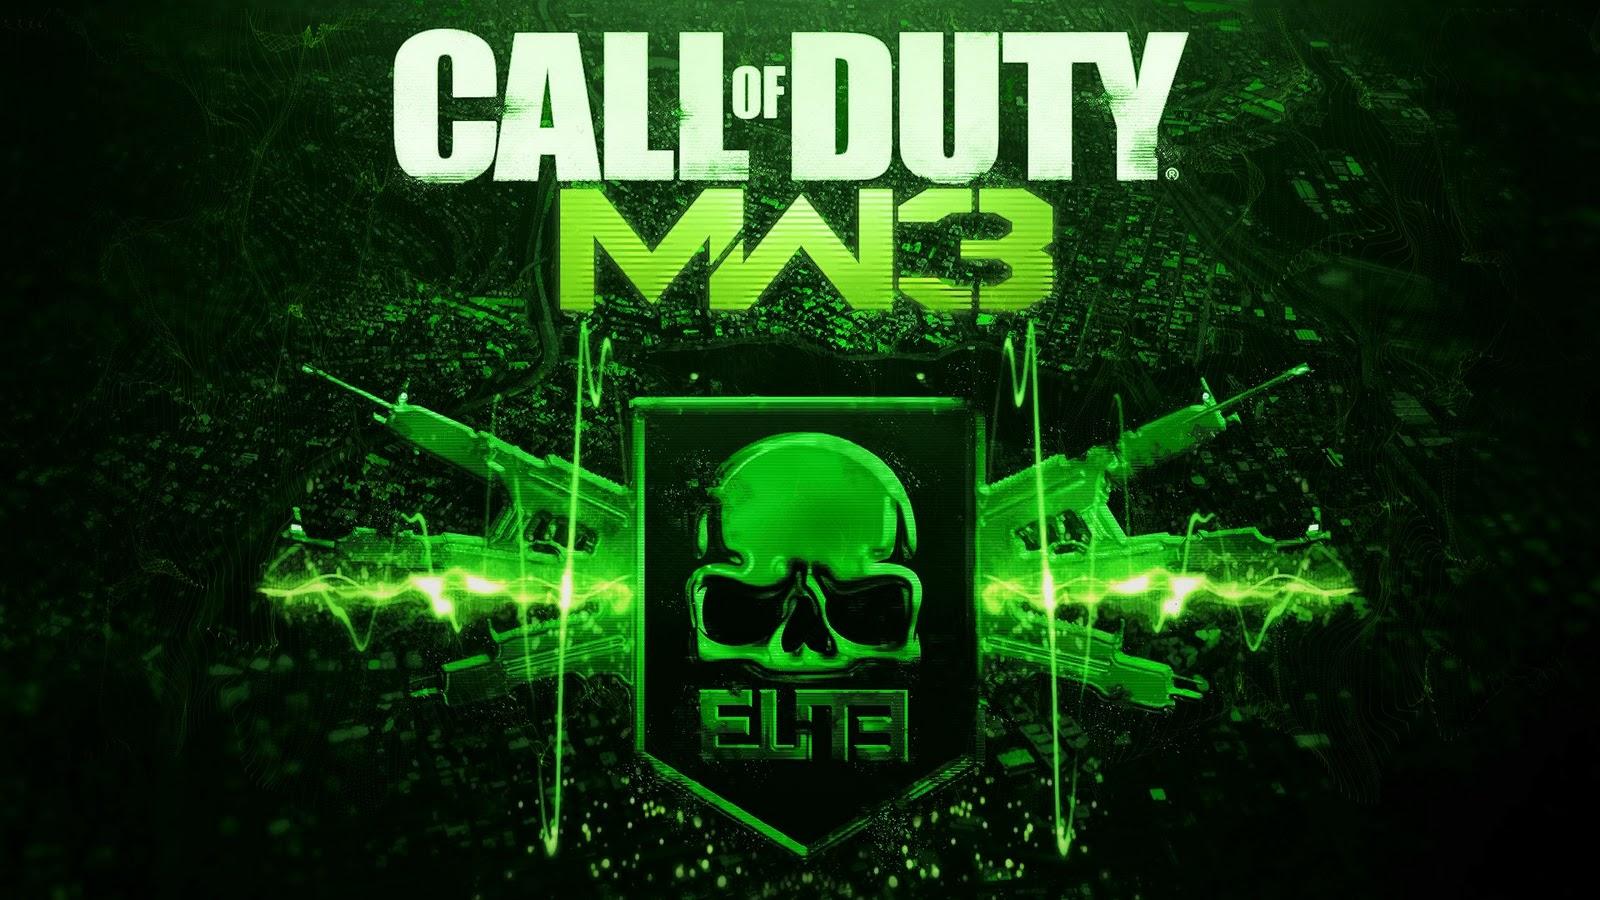 Call Duty Wm3 Wallpaper